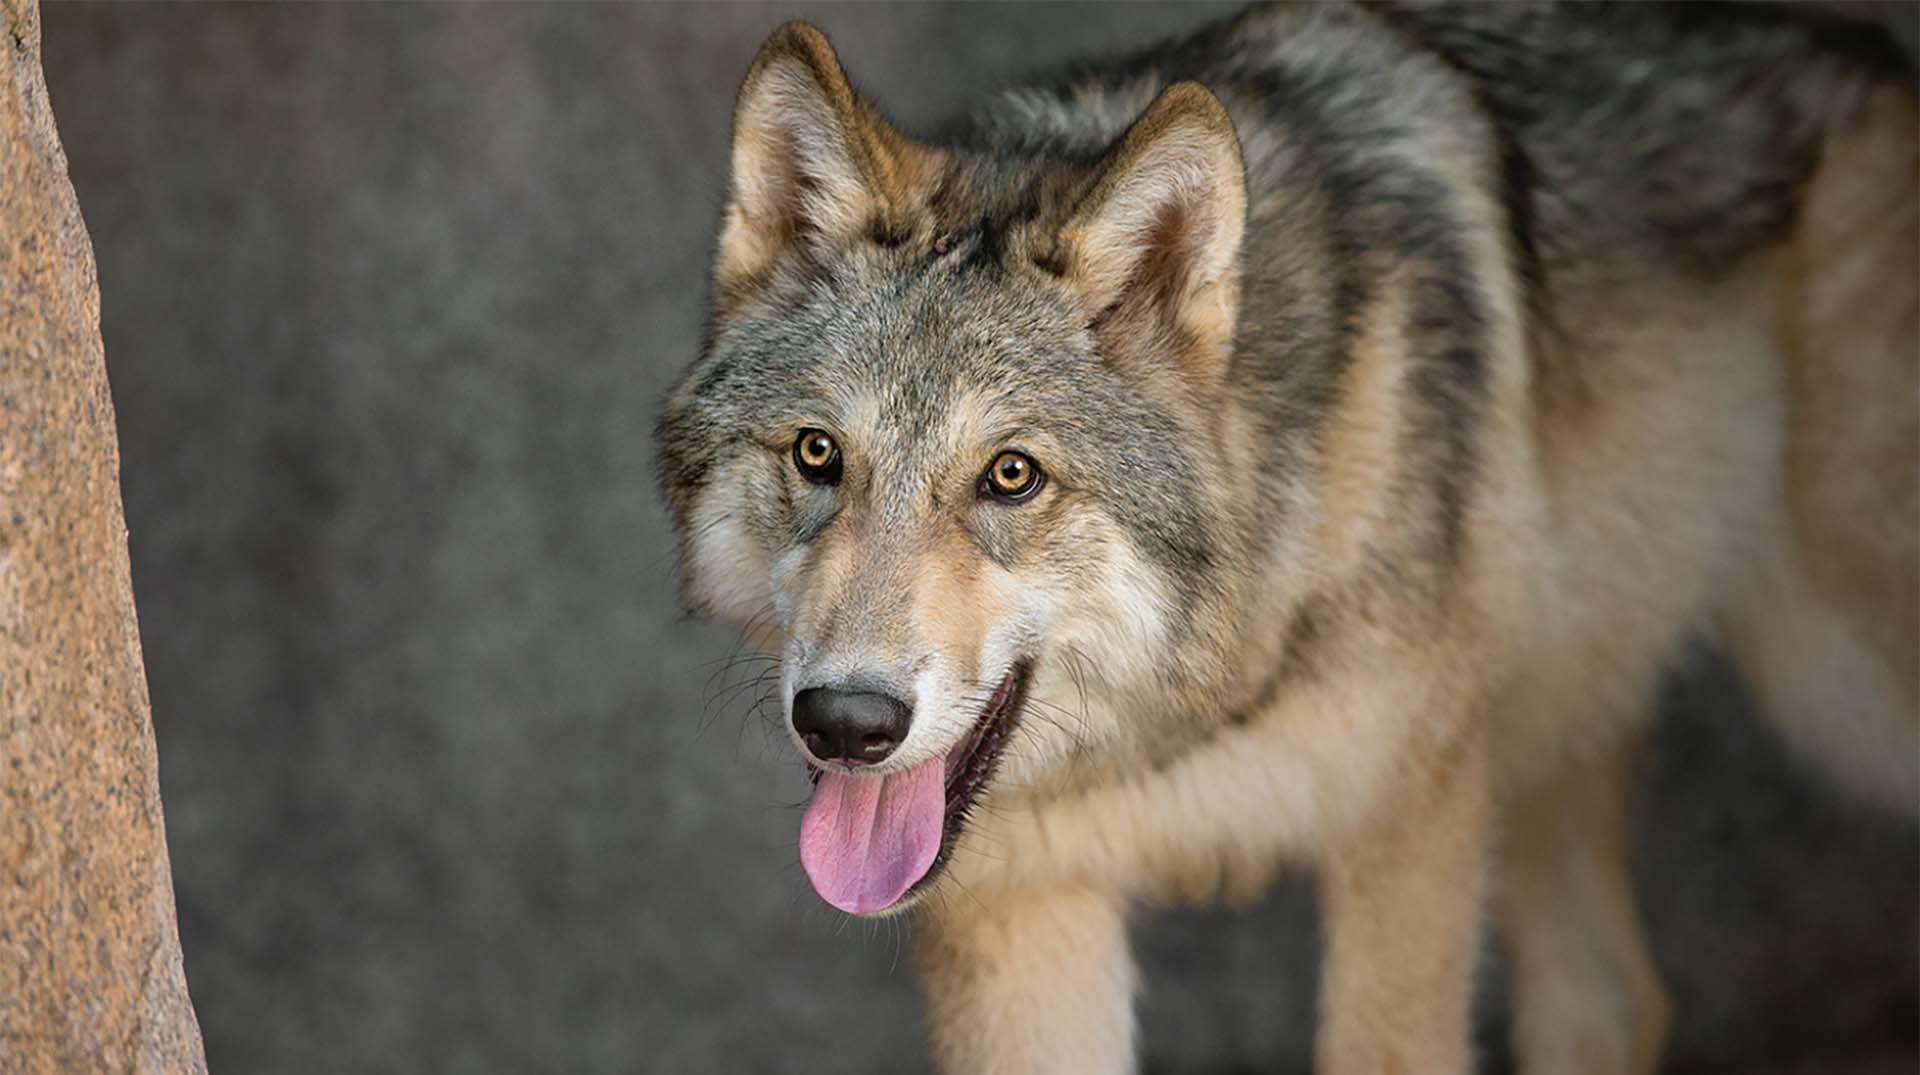 Wolf | San Diego Zoo Animals & Plants